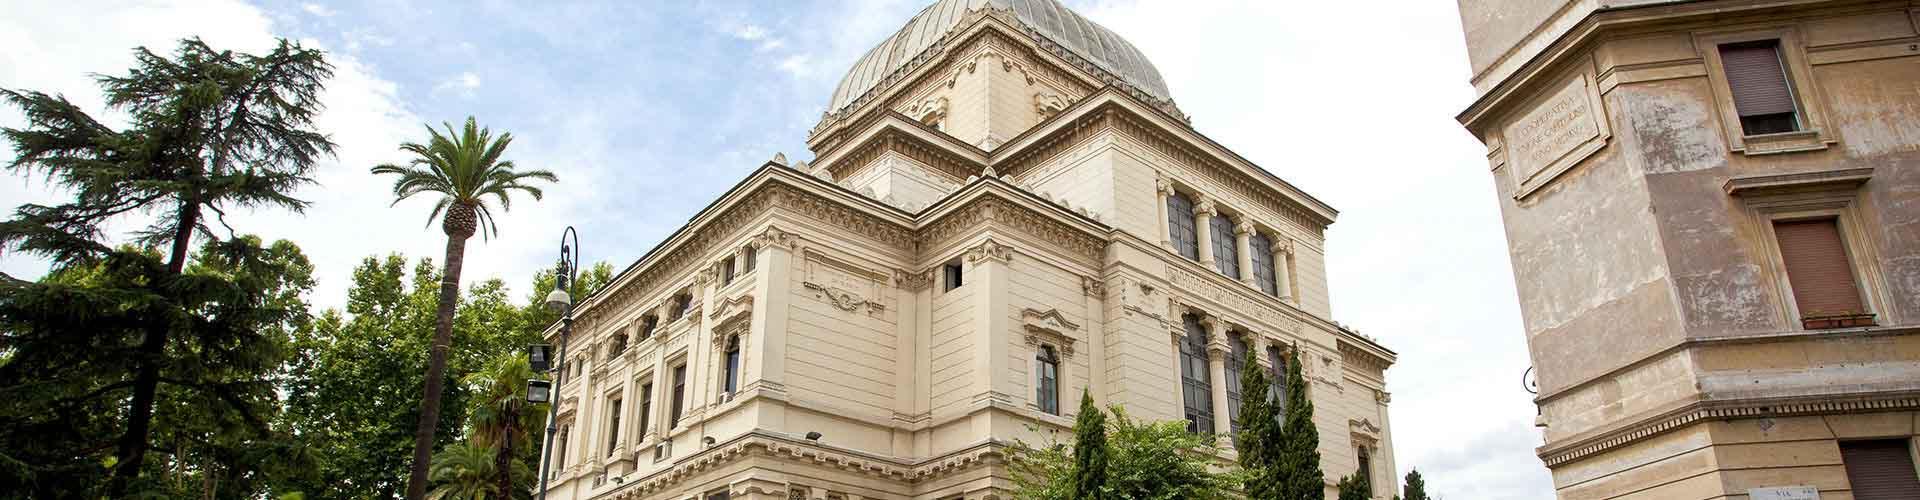 Roma - Hostales cerca a Gran Sinagoga de Roma. Mapas de Roma, Fotos y comentarios de cada Hostal en Roma.